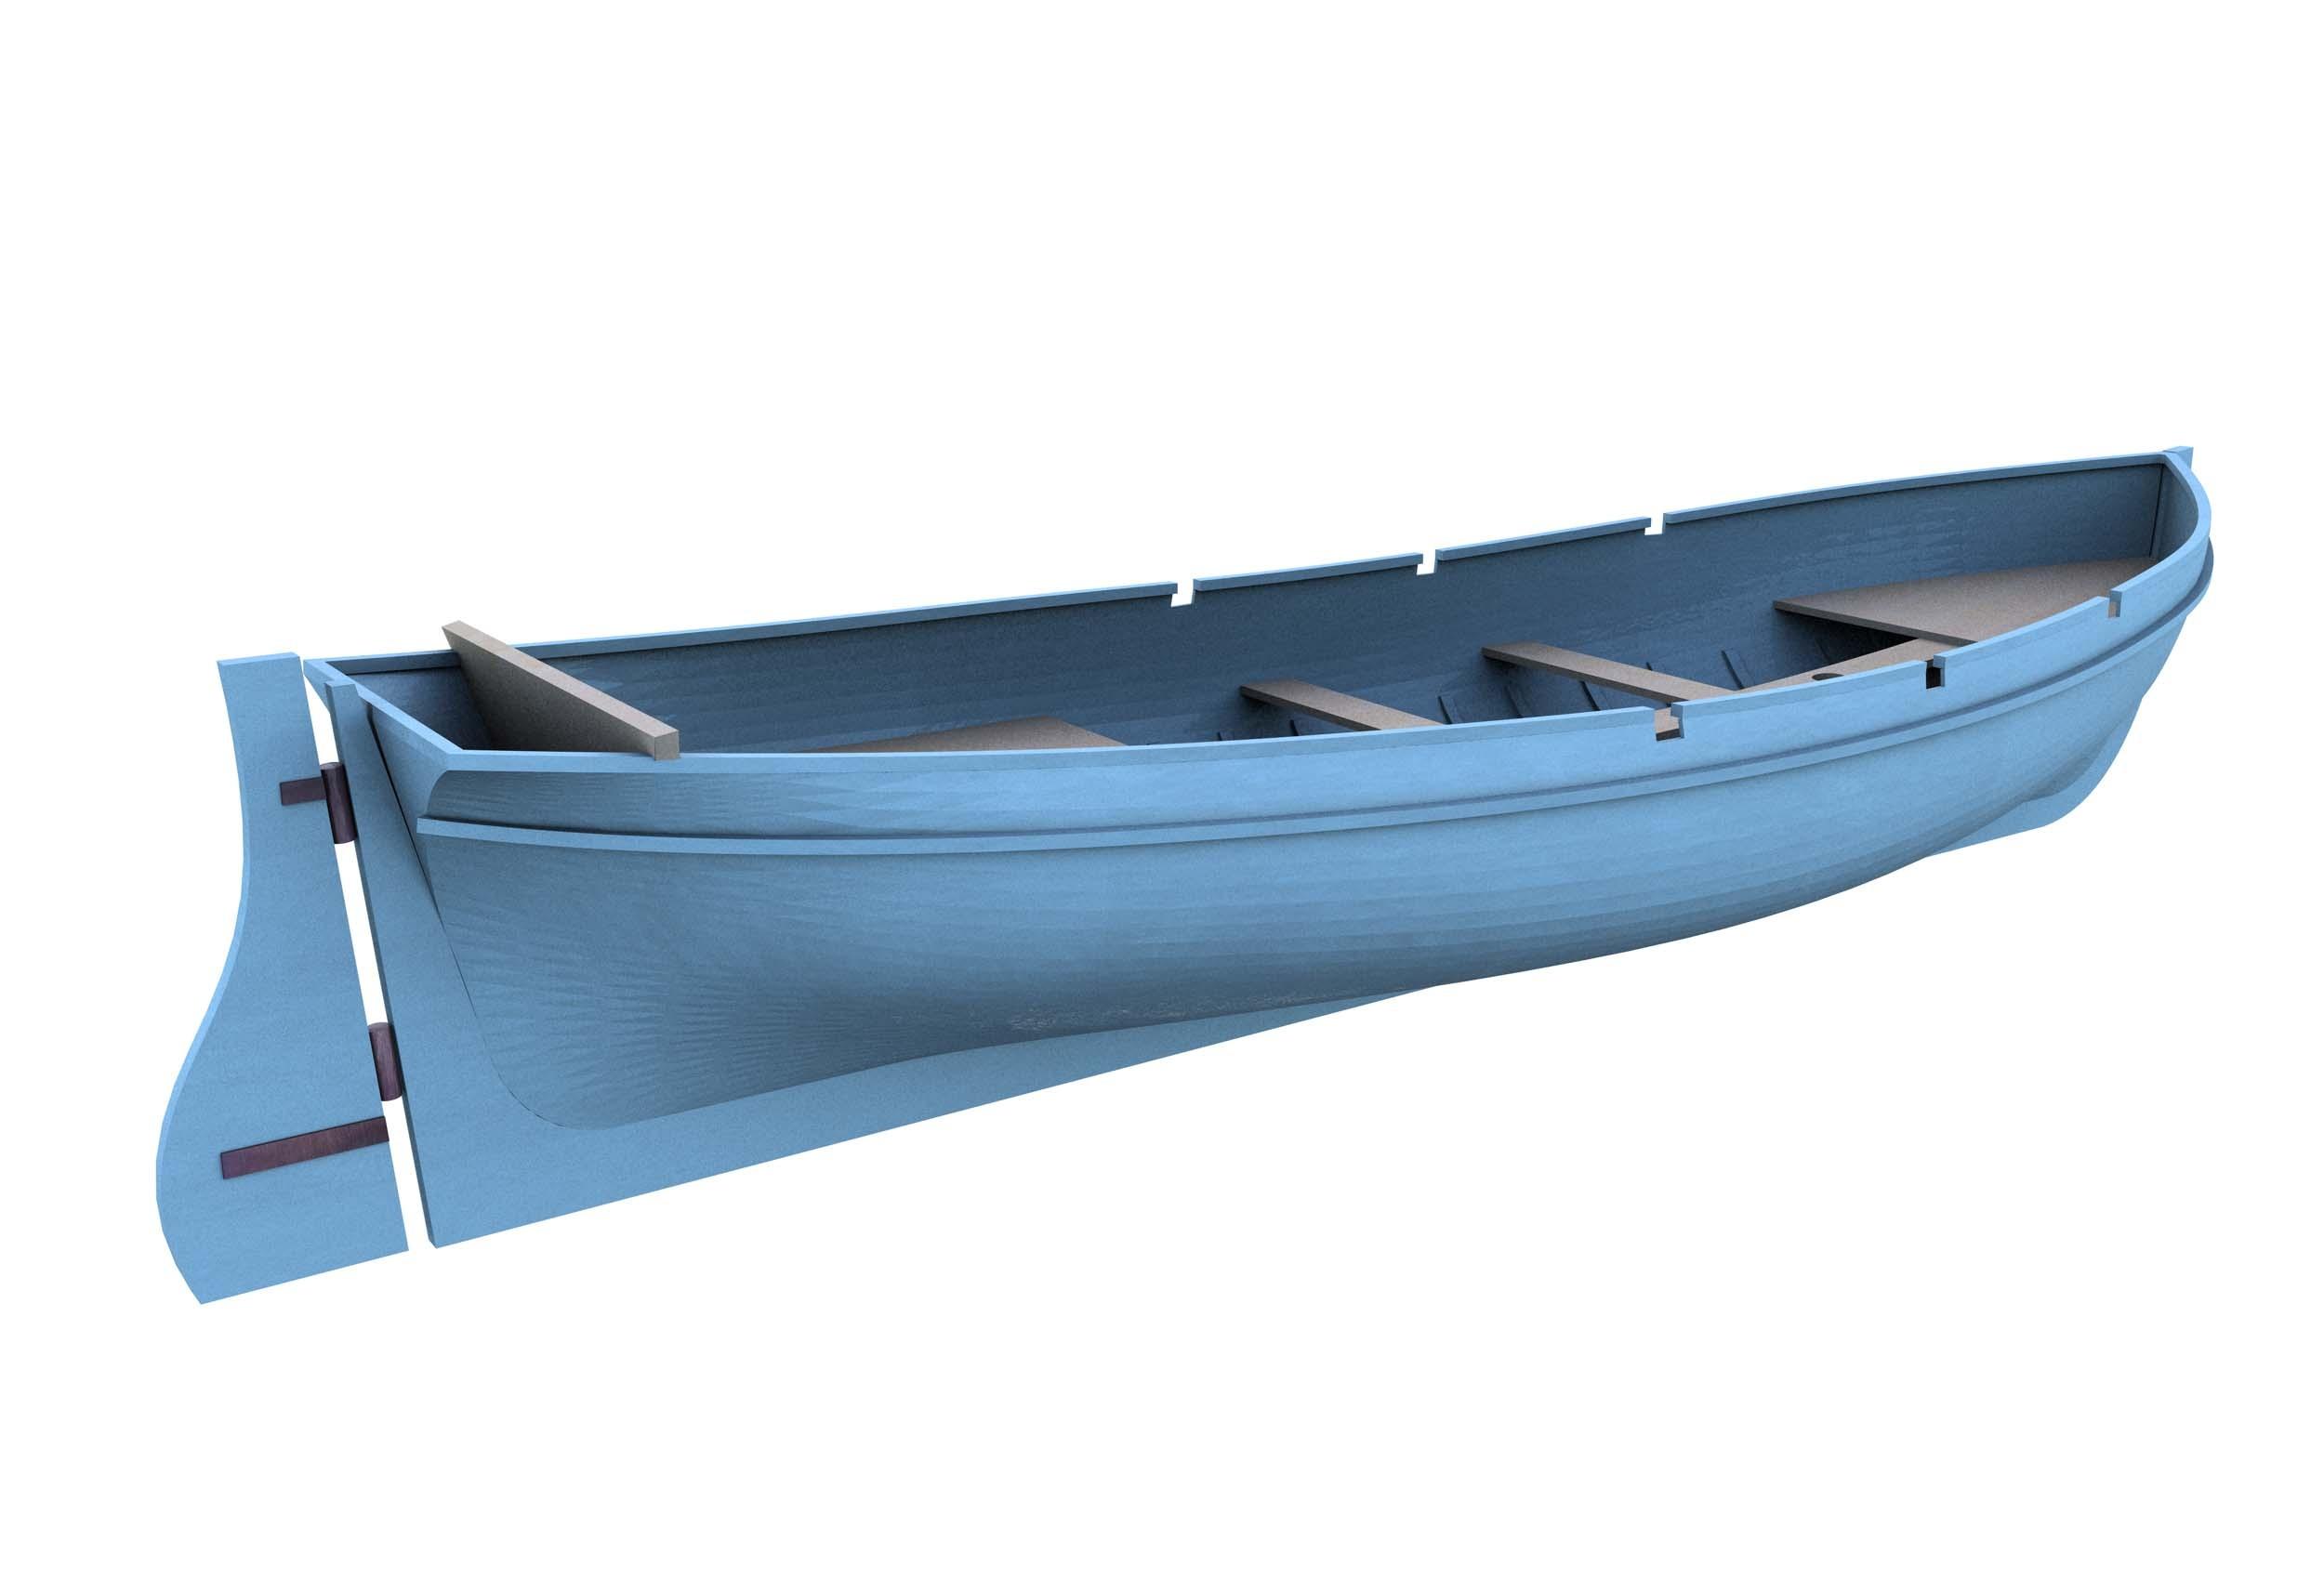 https://0901.nccdn.net/4_2/000/000/038/2d3/CK95-Individual-Small-Boat-NormalJolle-Starboard-Side-2500x1700.jpg